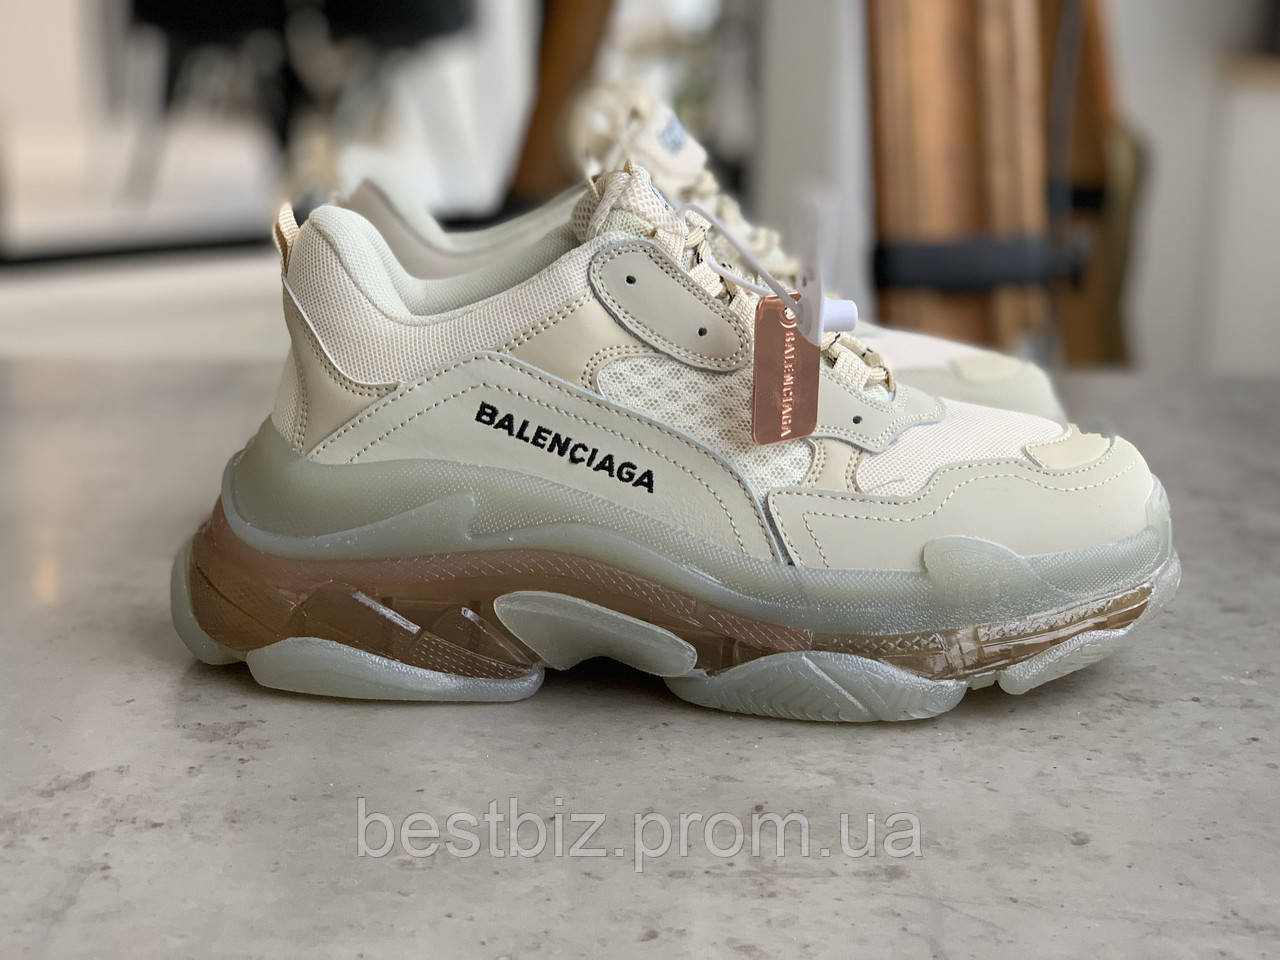 Кроссовки Balenciaga Triple S Beige Баленсиага Трипл С Бежевые (36,37,38)